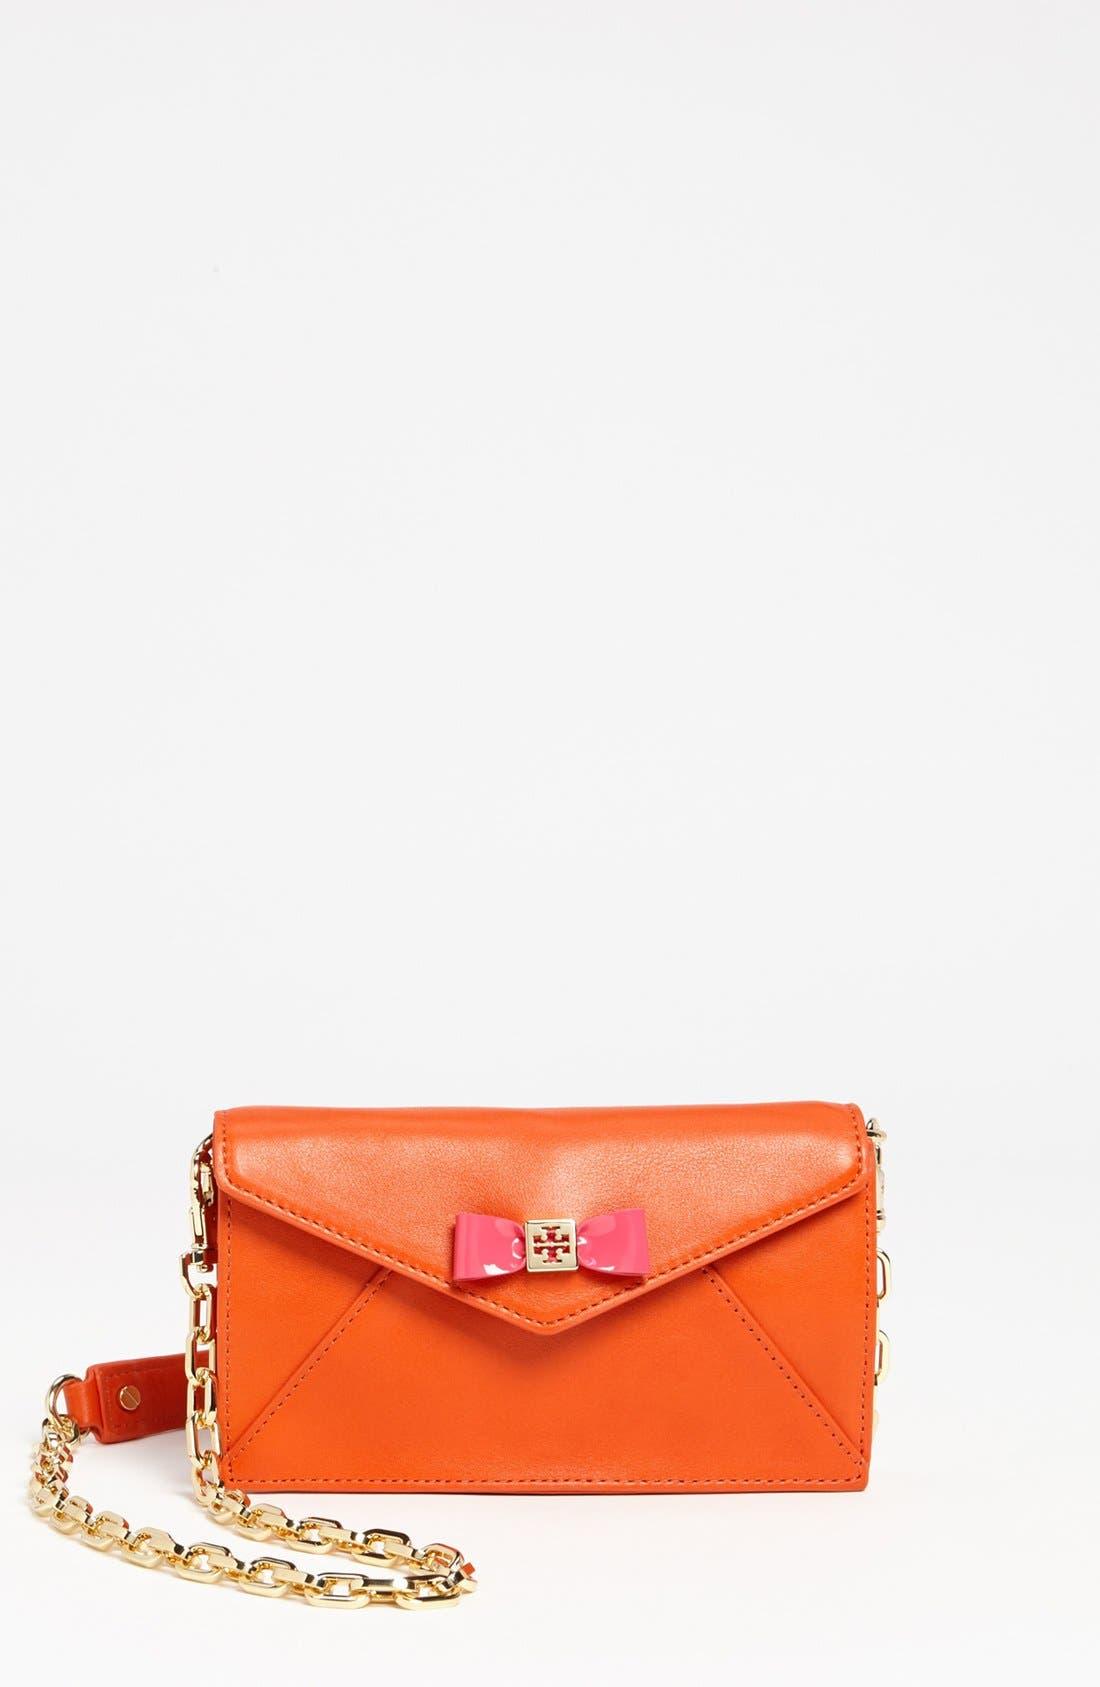 Main Image - Tory Burch 'Bow Envelope - Mini' Crossbody Bag